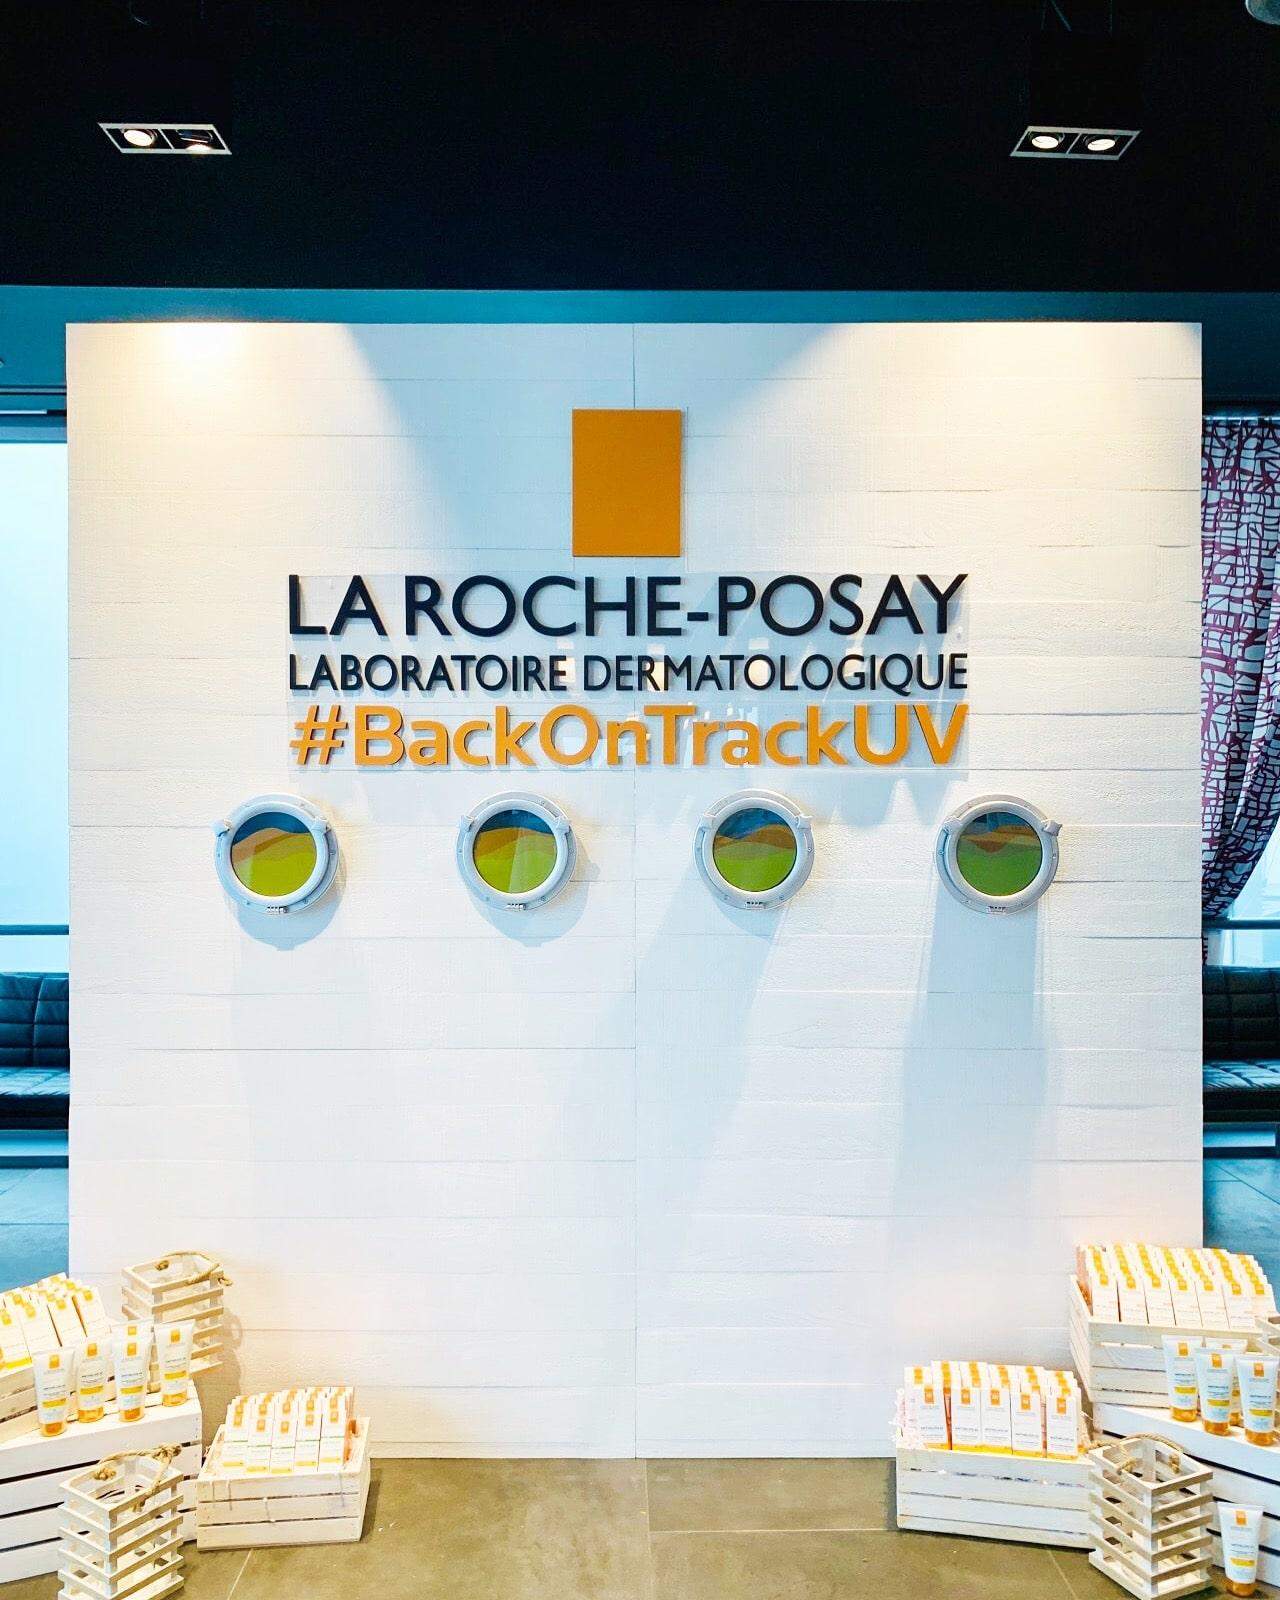 La Roche-Posay Branded Wall - B Floral